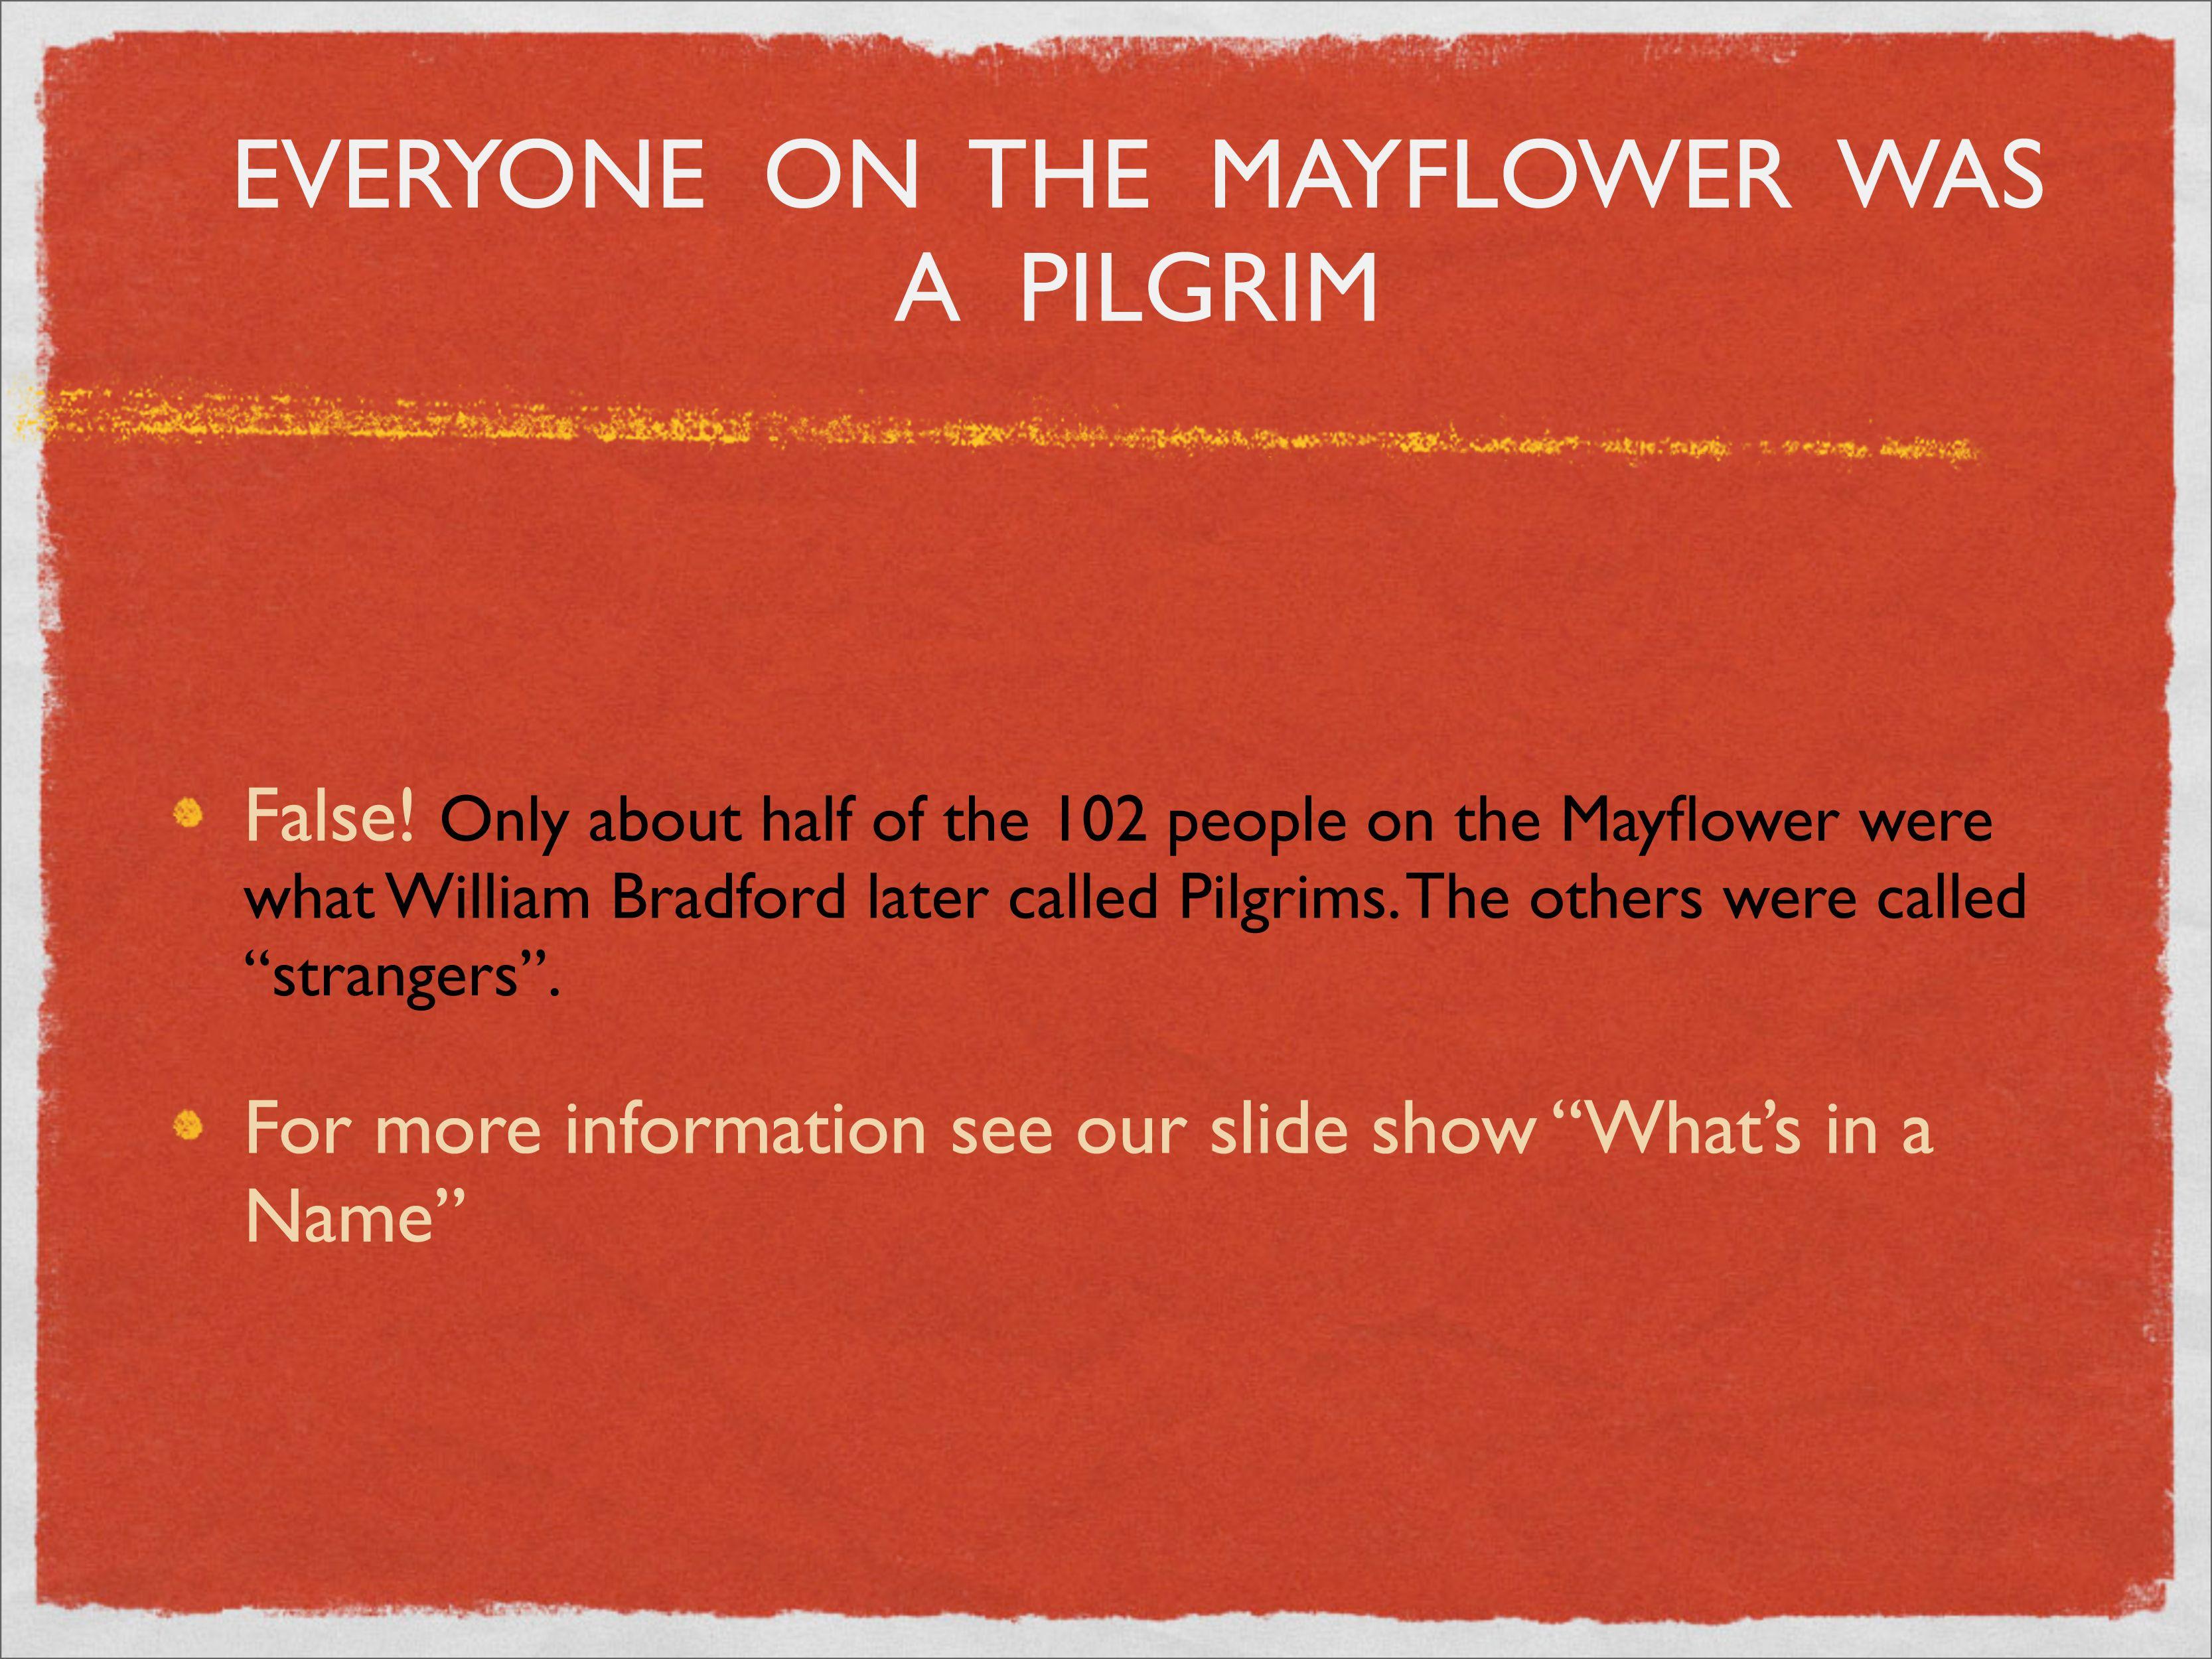 The Mayflower passengers were all pilgrims... true or